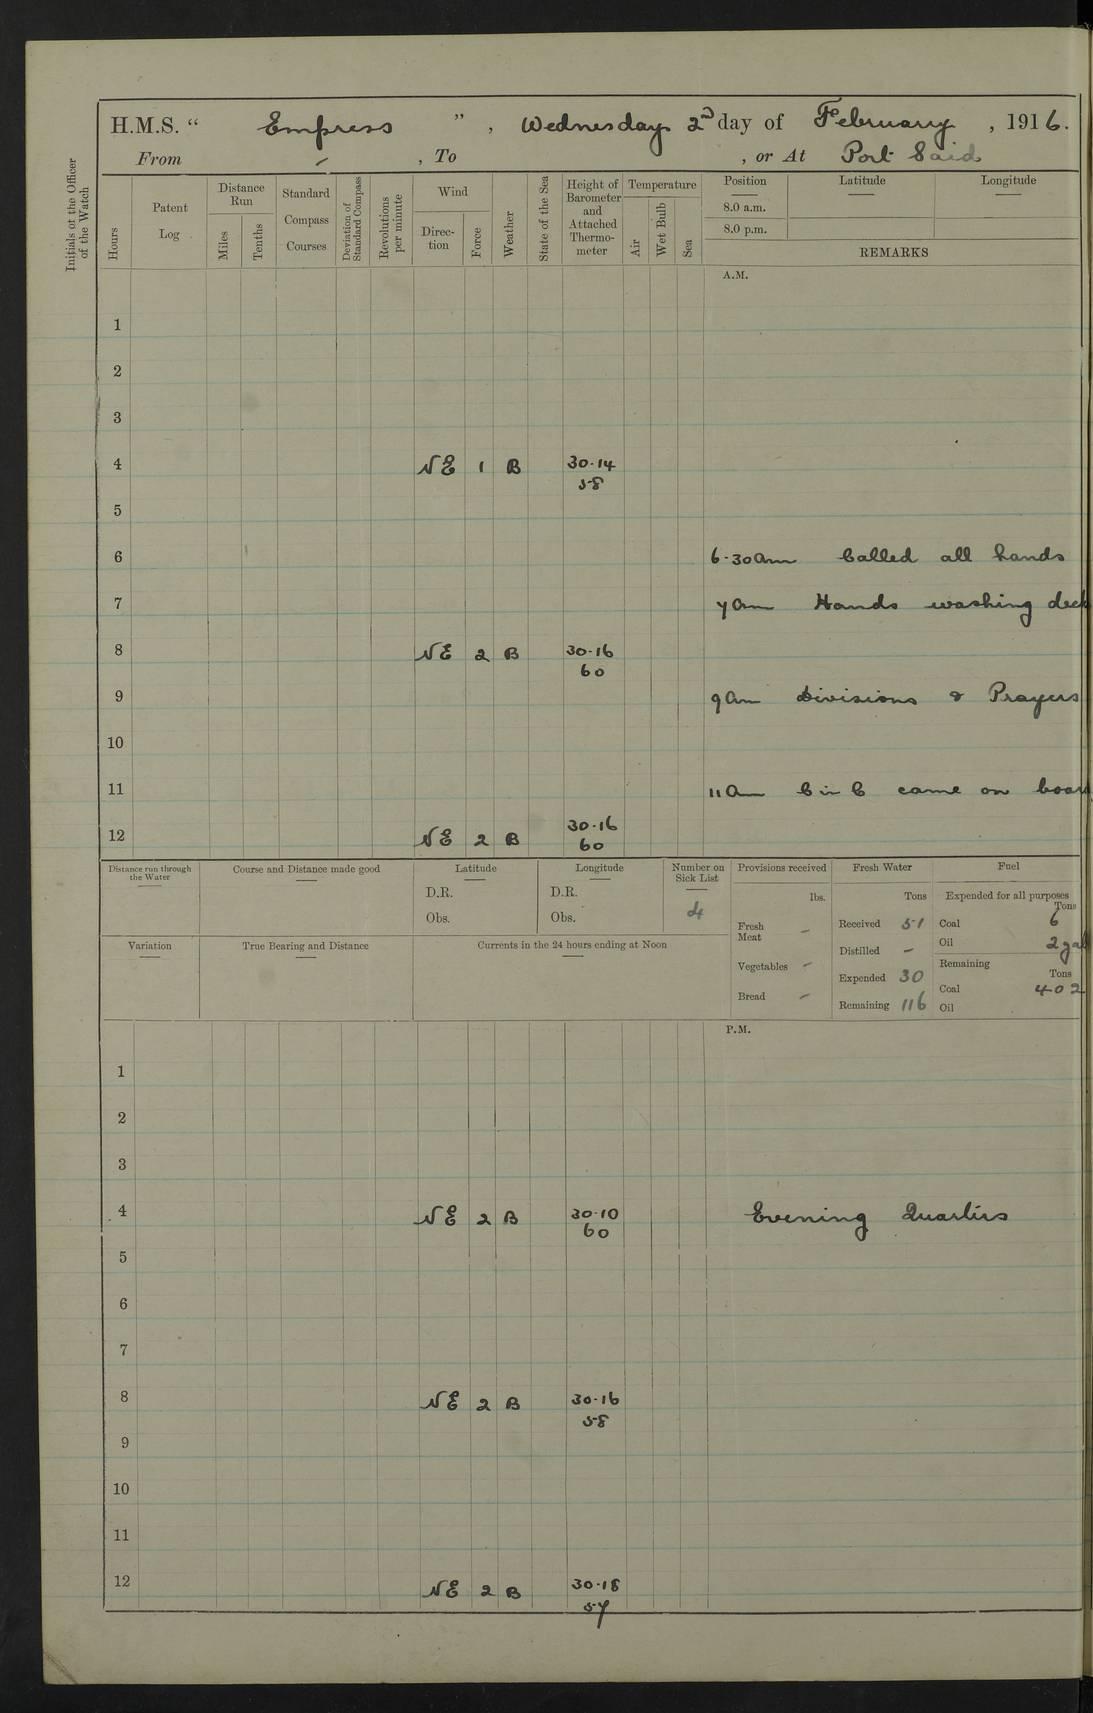 Hms Empress Seaplane Carrier British Warships Of World War 1 1935 Plymouth Wiring Diagram 4ef4fb71e53e0a0c91005ba9 Https S3amazonawscom443 Oldweather Adm53 40784 0024 0